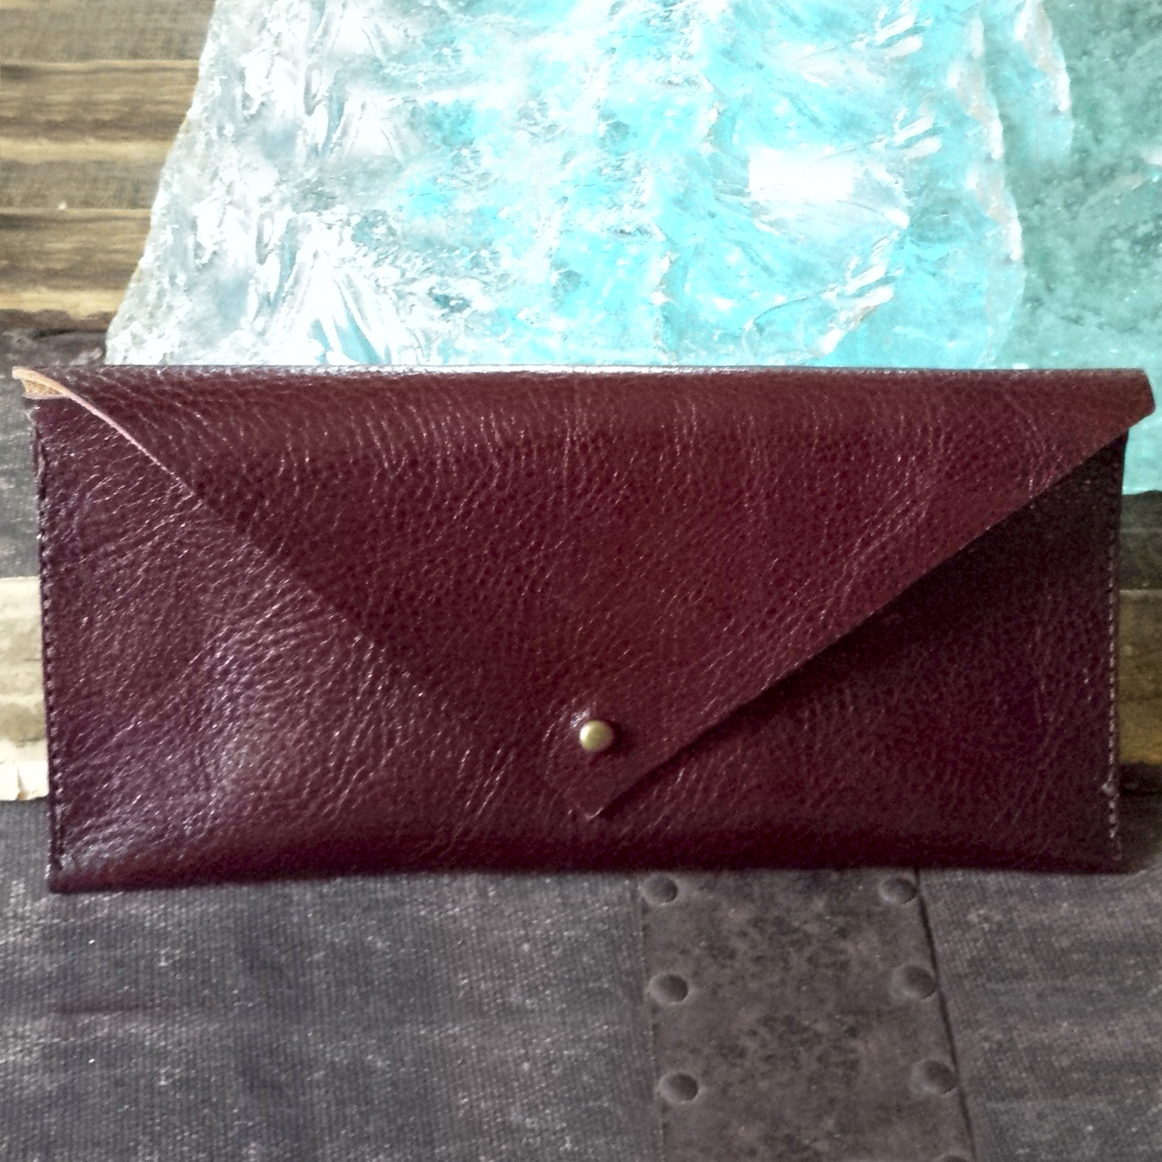 Leather Envelope Clutch – Oxblood – $45